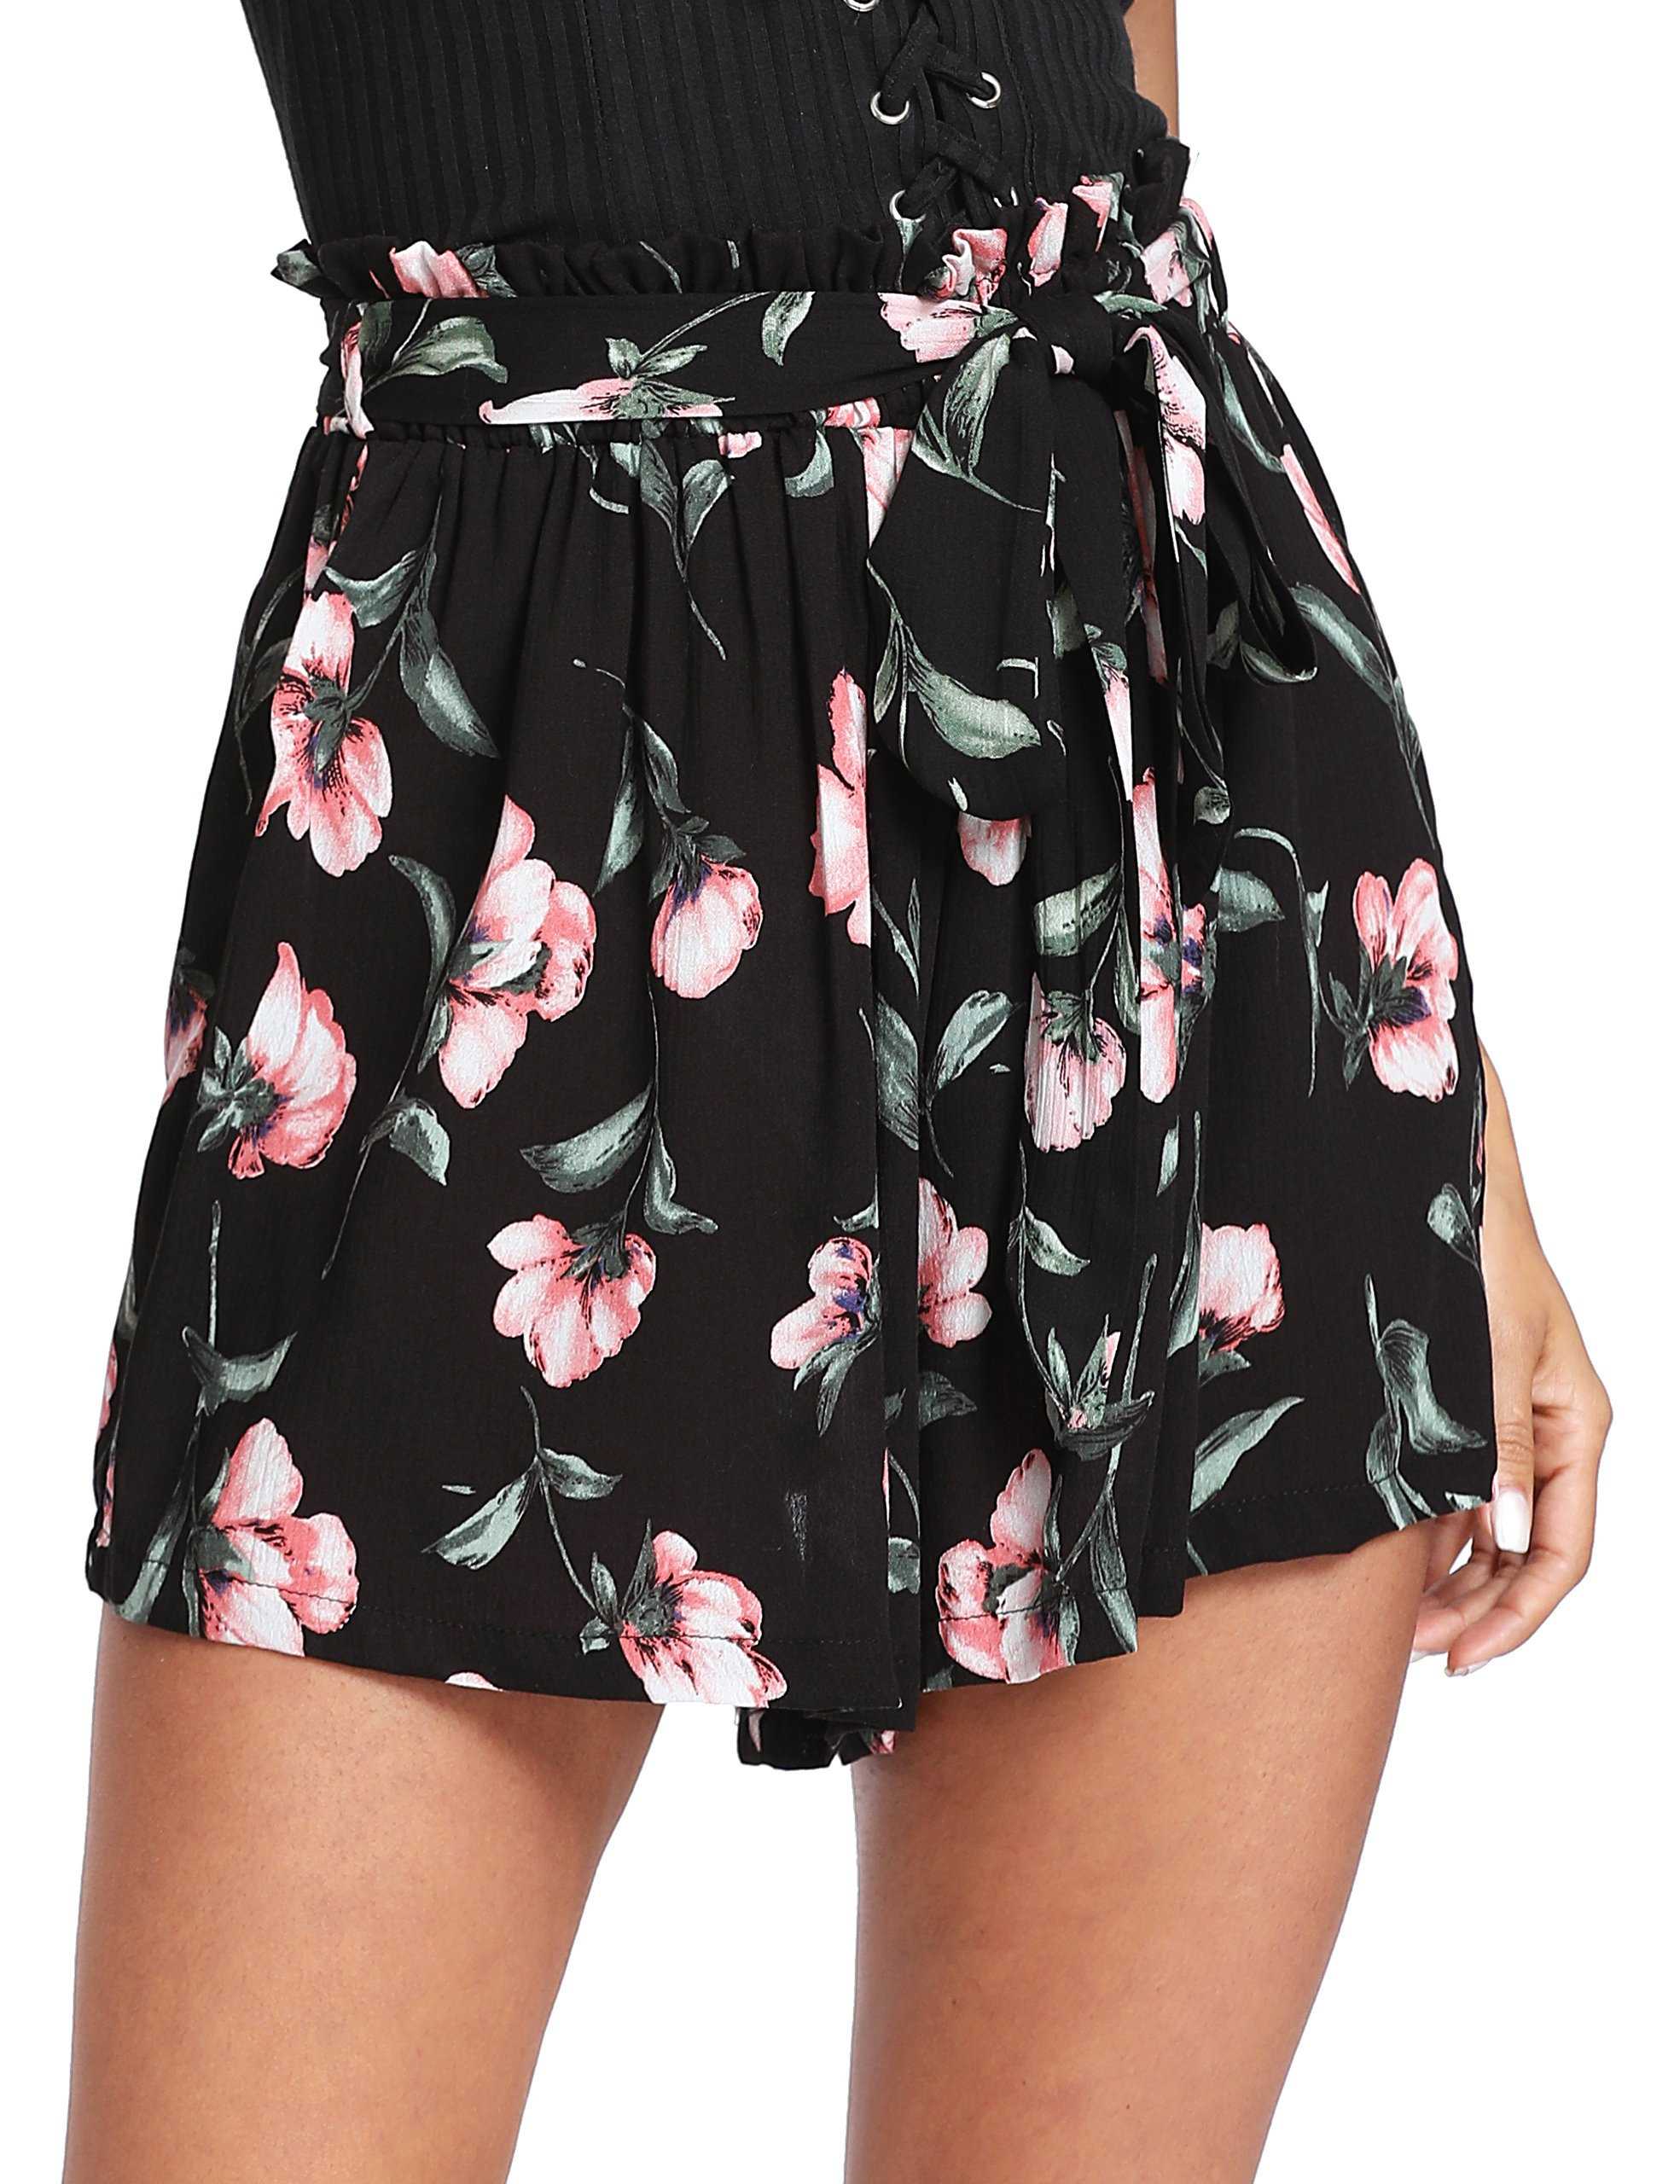 Floerns Women's Tie Bow Floral Print Summer Beach Elastic Shorts Black M